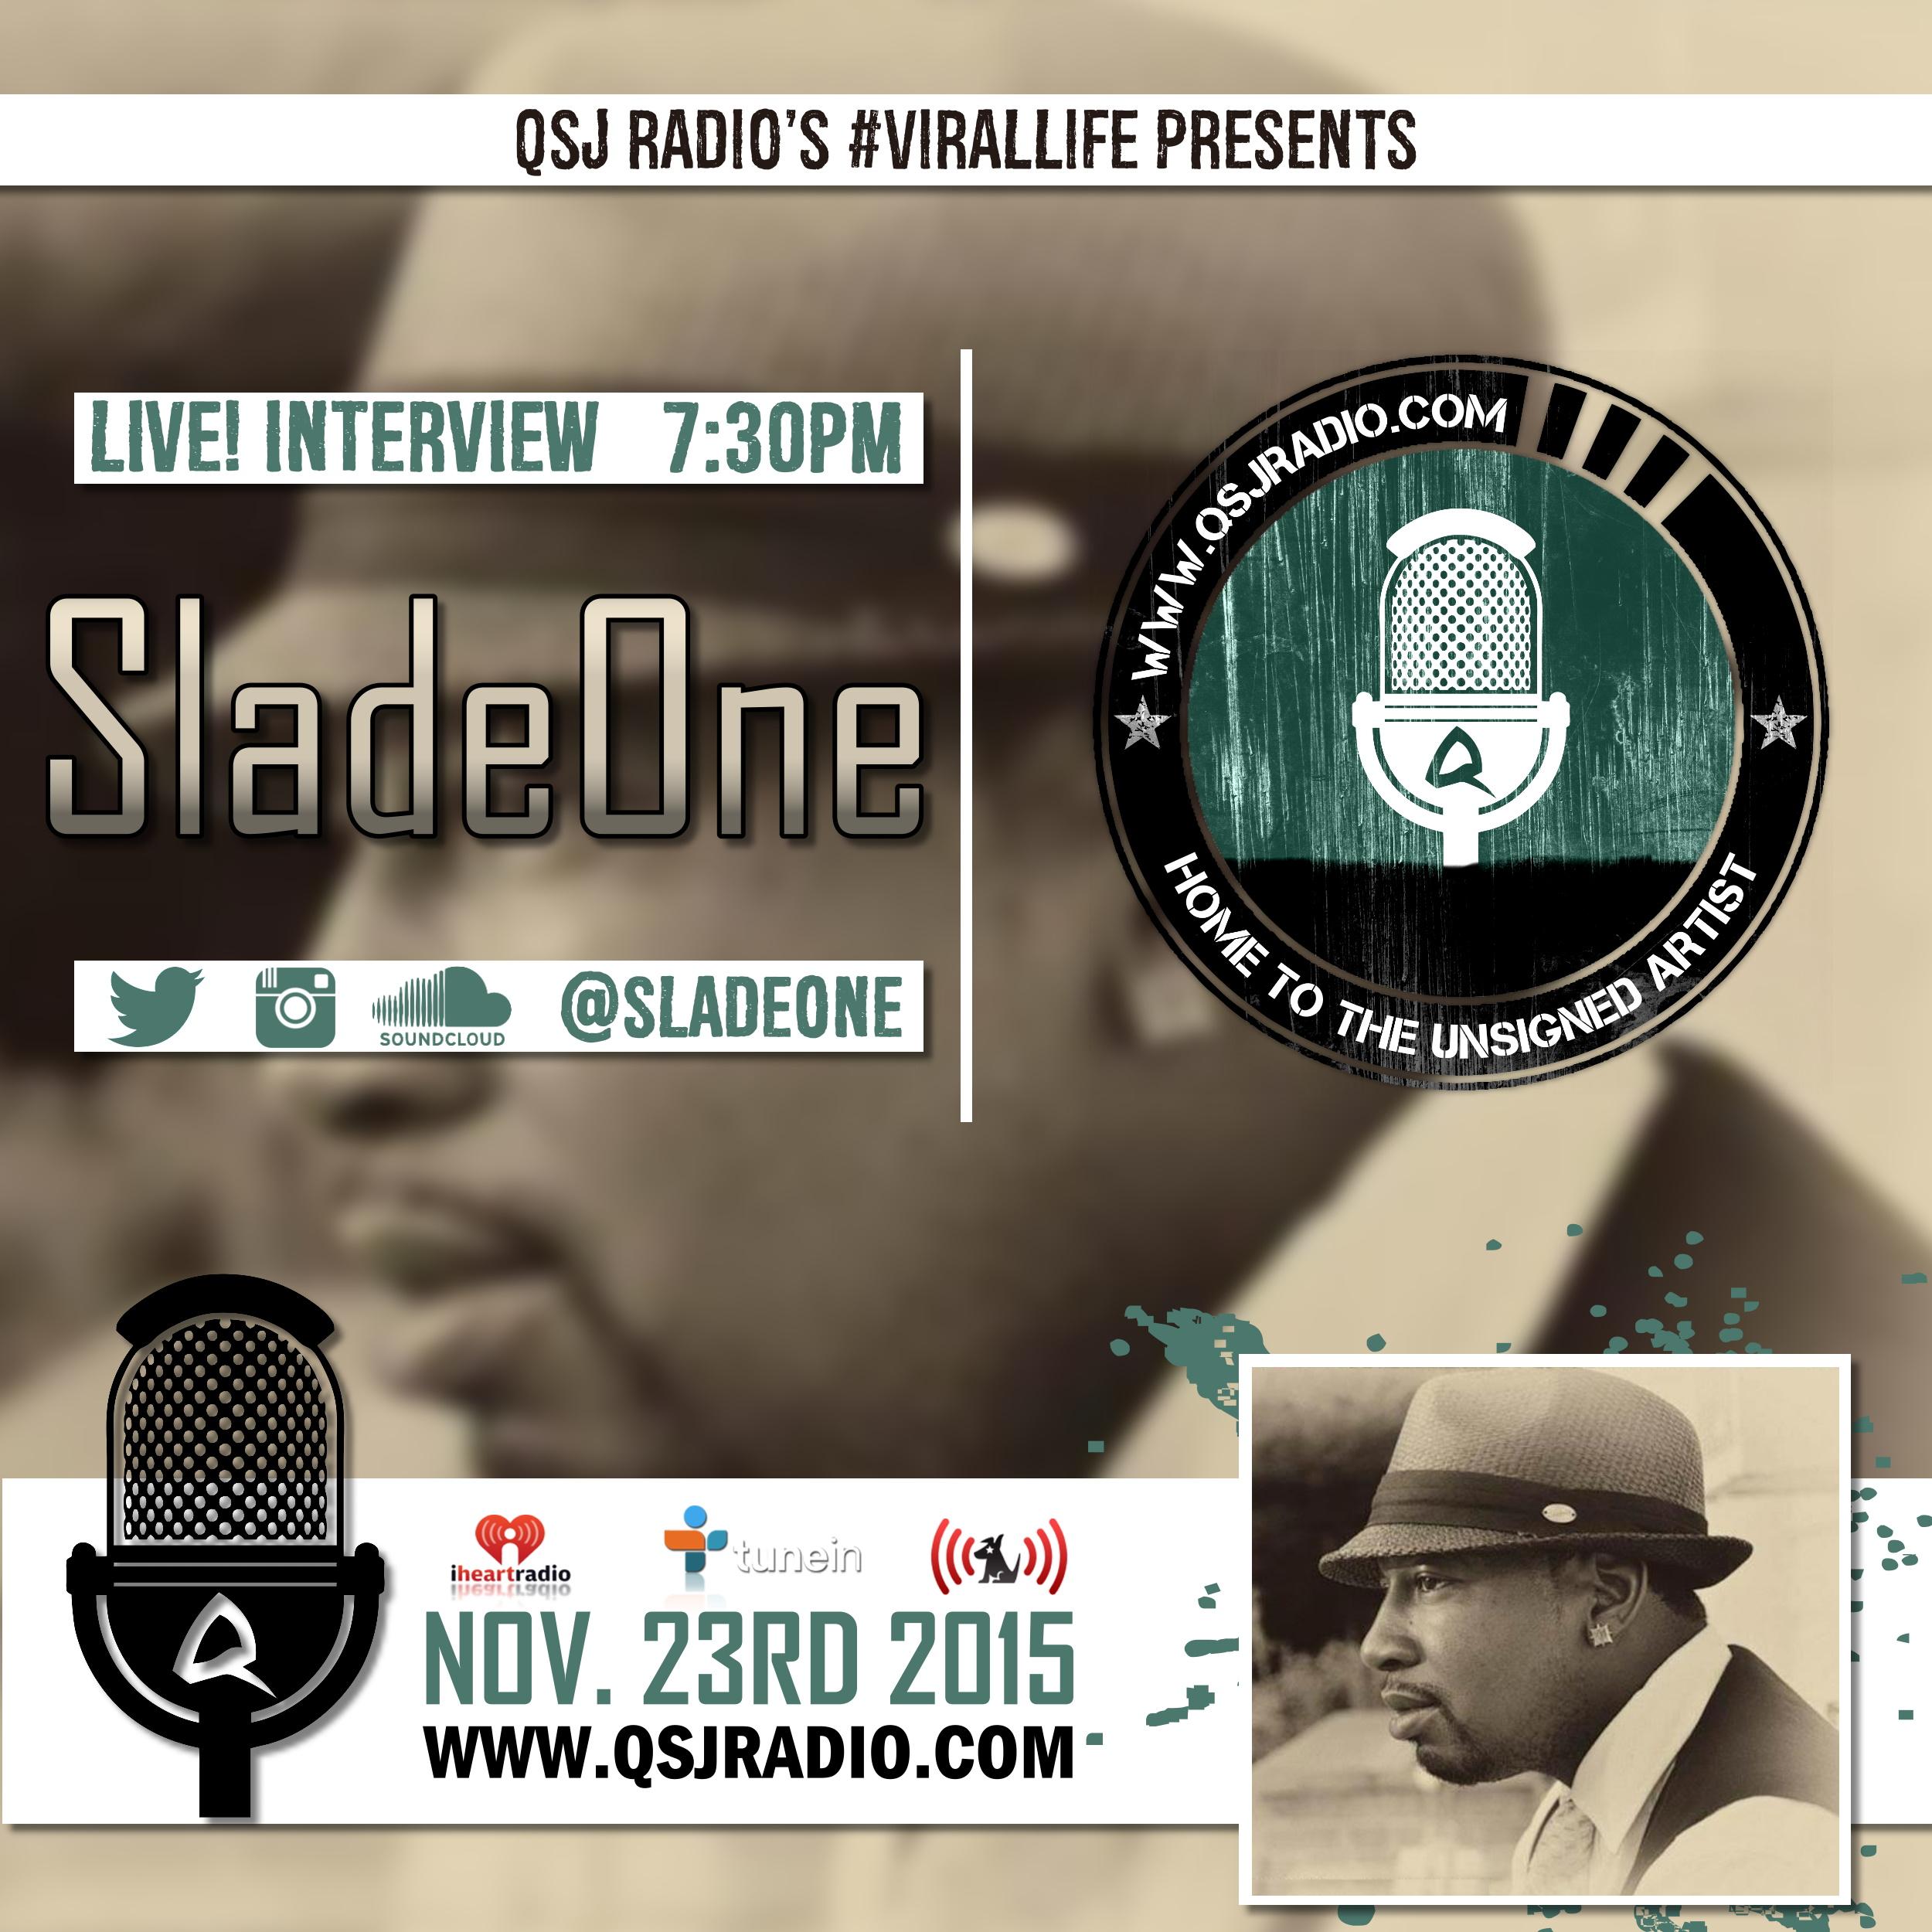 Artwork for 11.23.2015 QSJ Radio #ViralLife Interview SladeOne @SladeOne